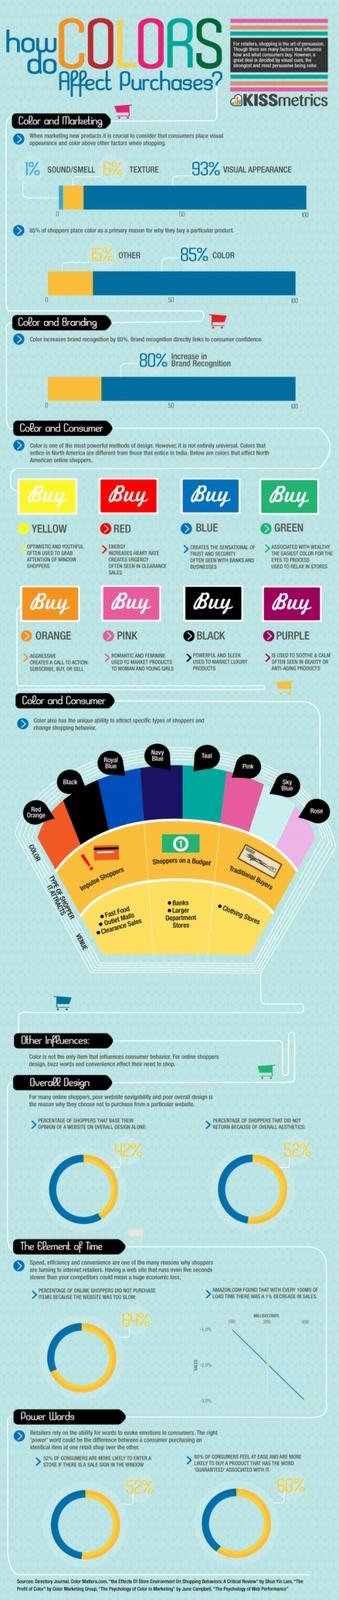 How do colors affect purchases? #neuromarketing #webdesign #socialmedia